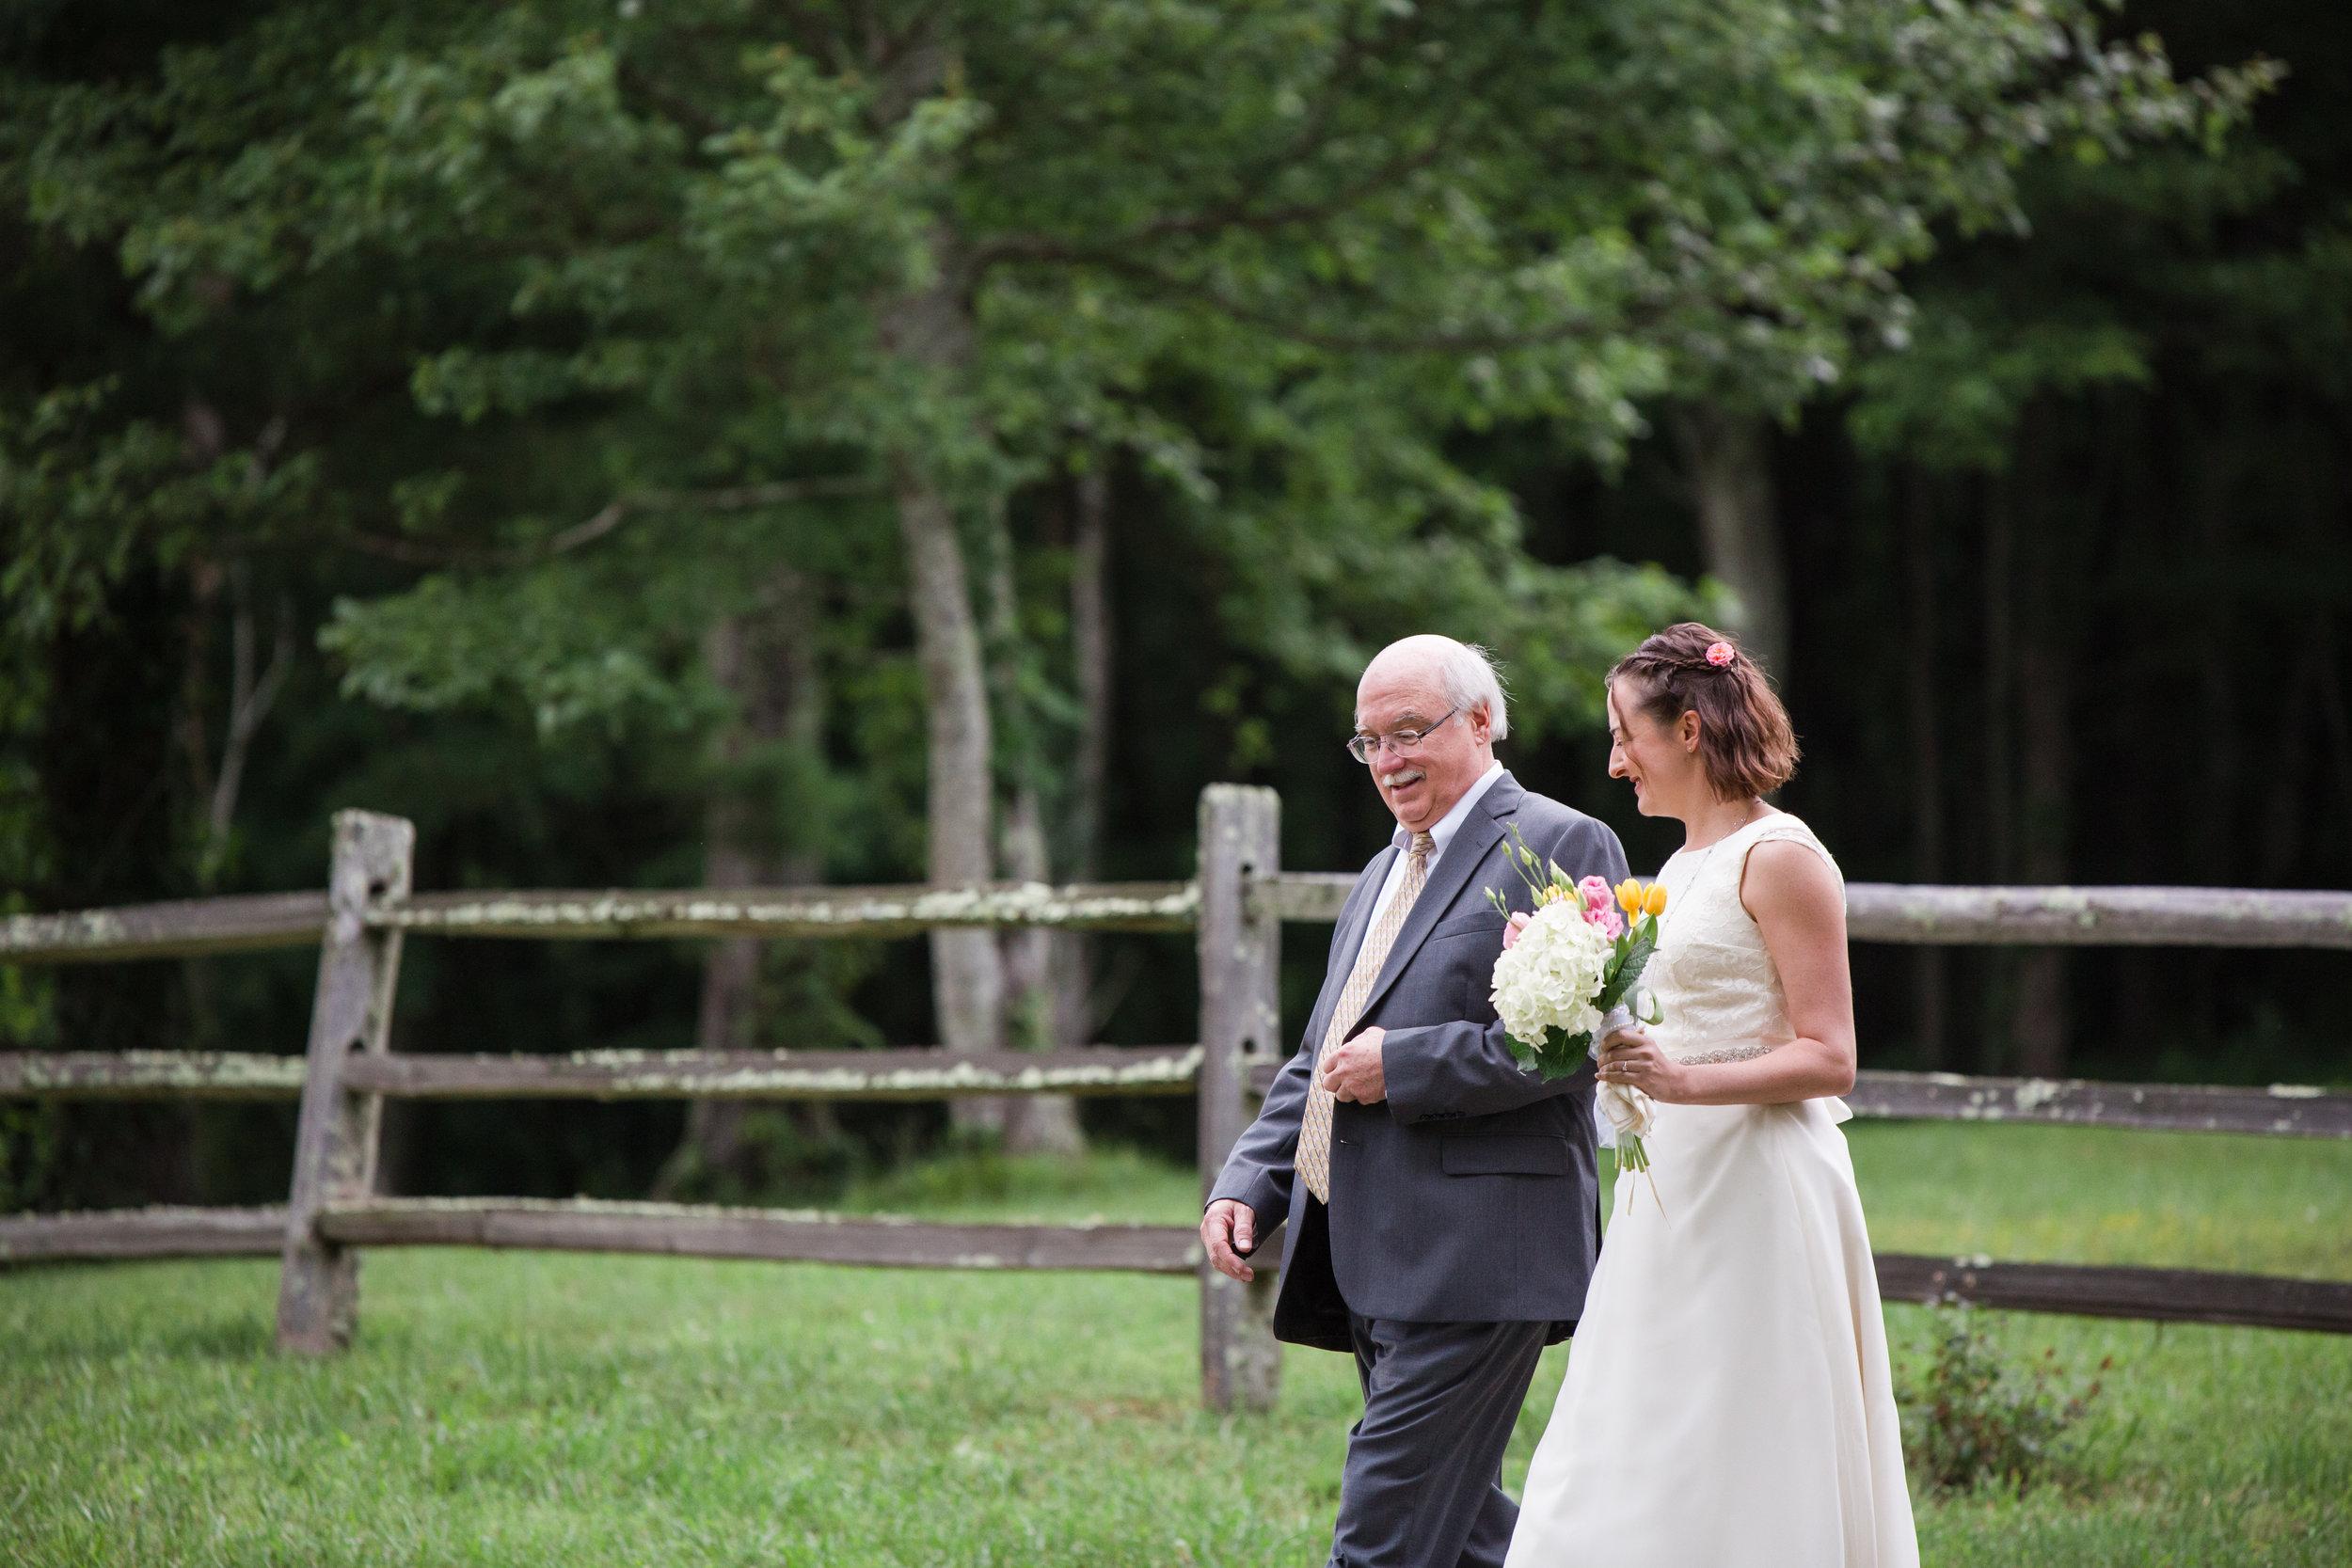 aubrey-joshua-wedding-55.jpg